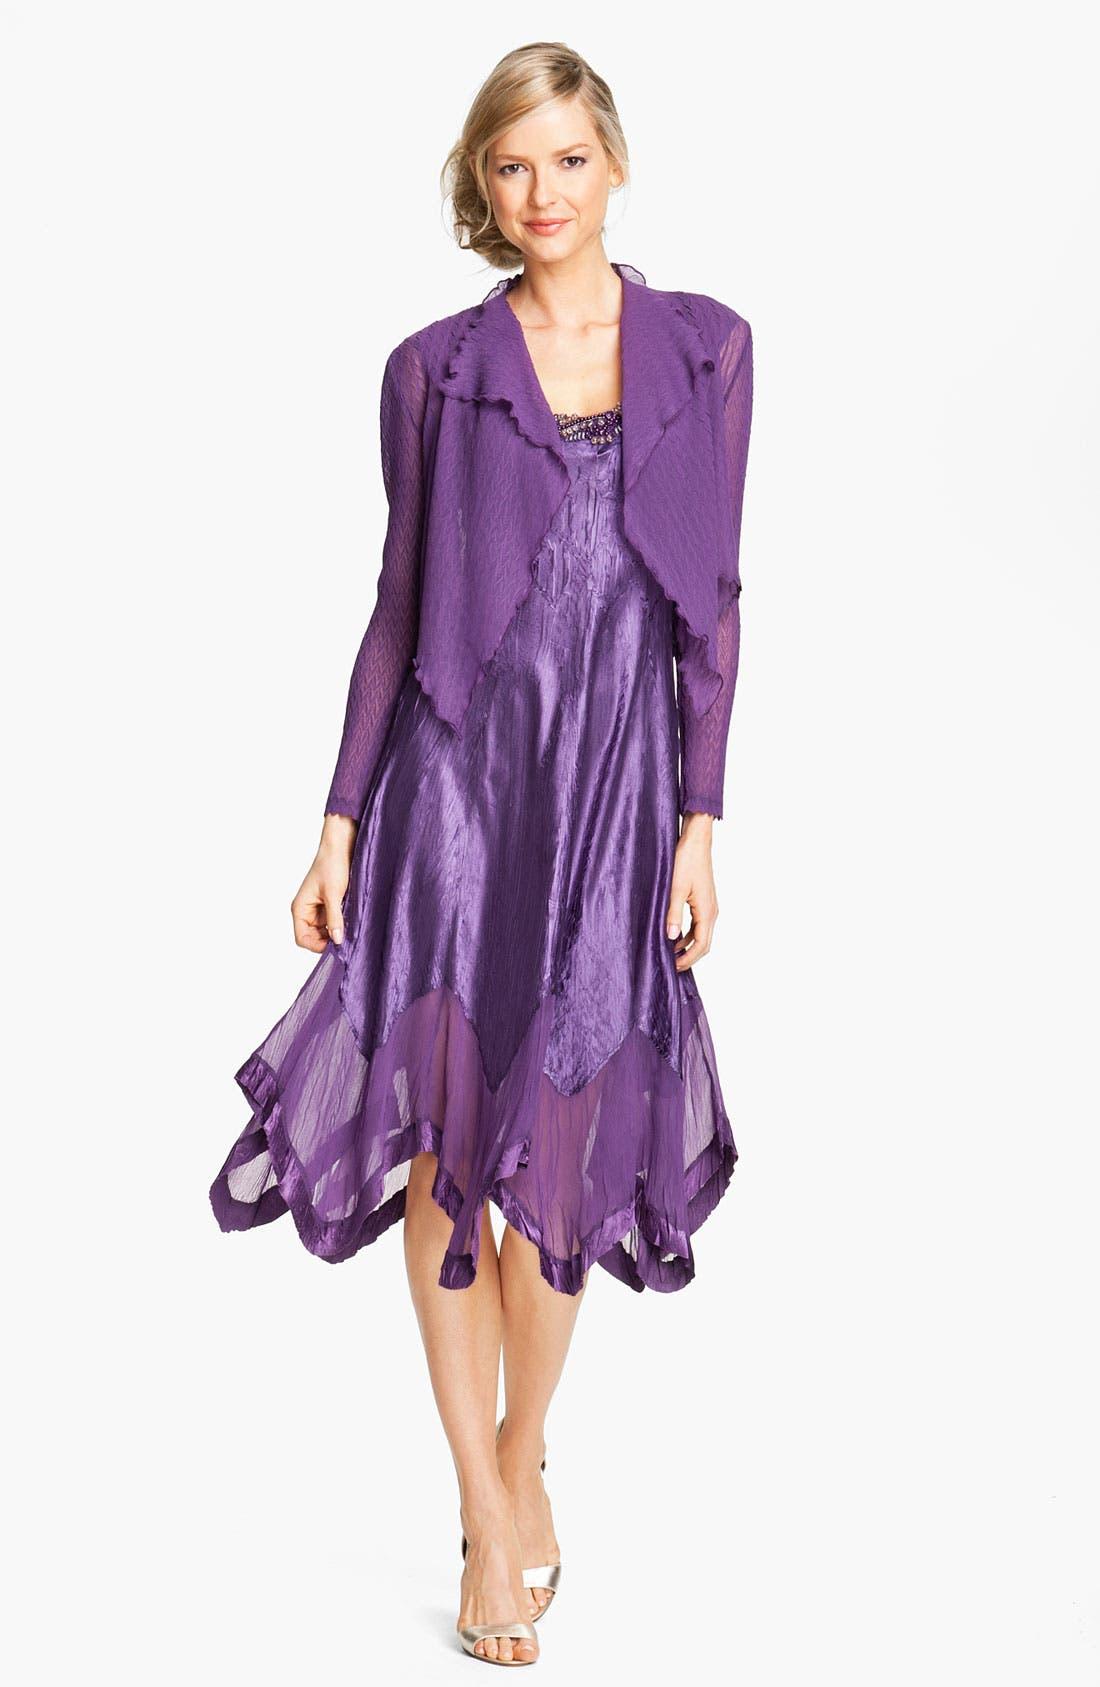 Alternate Image 1 Selected - Komarov Handkerchief Hem Charmeuse Dress & Chiffon Jacket (Regular & Petite)